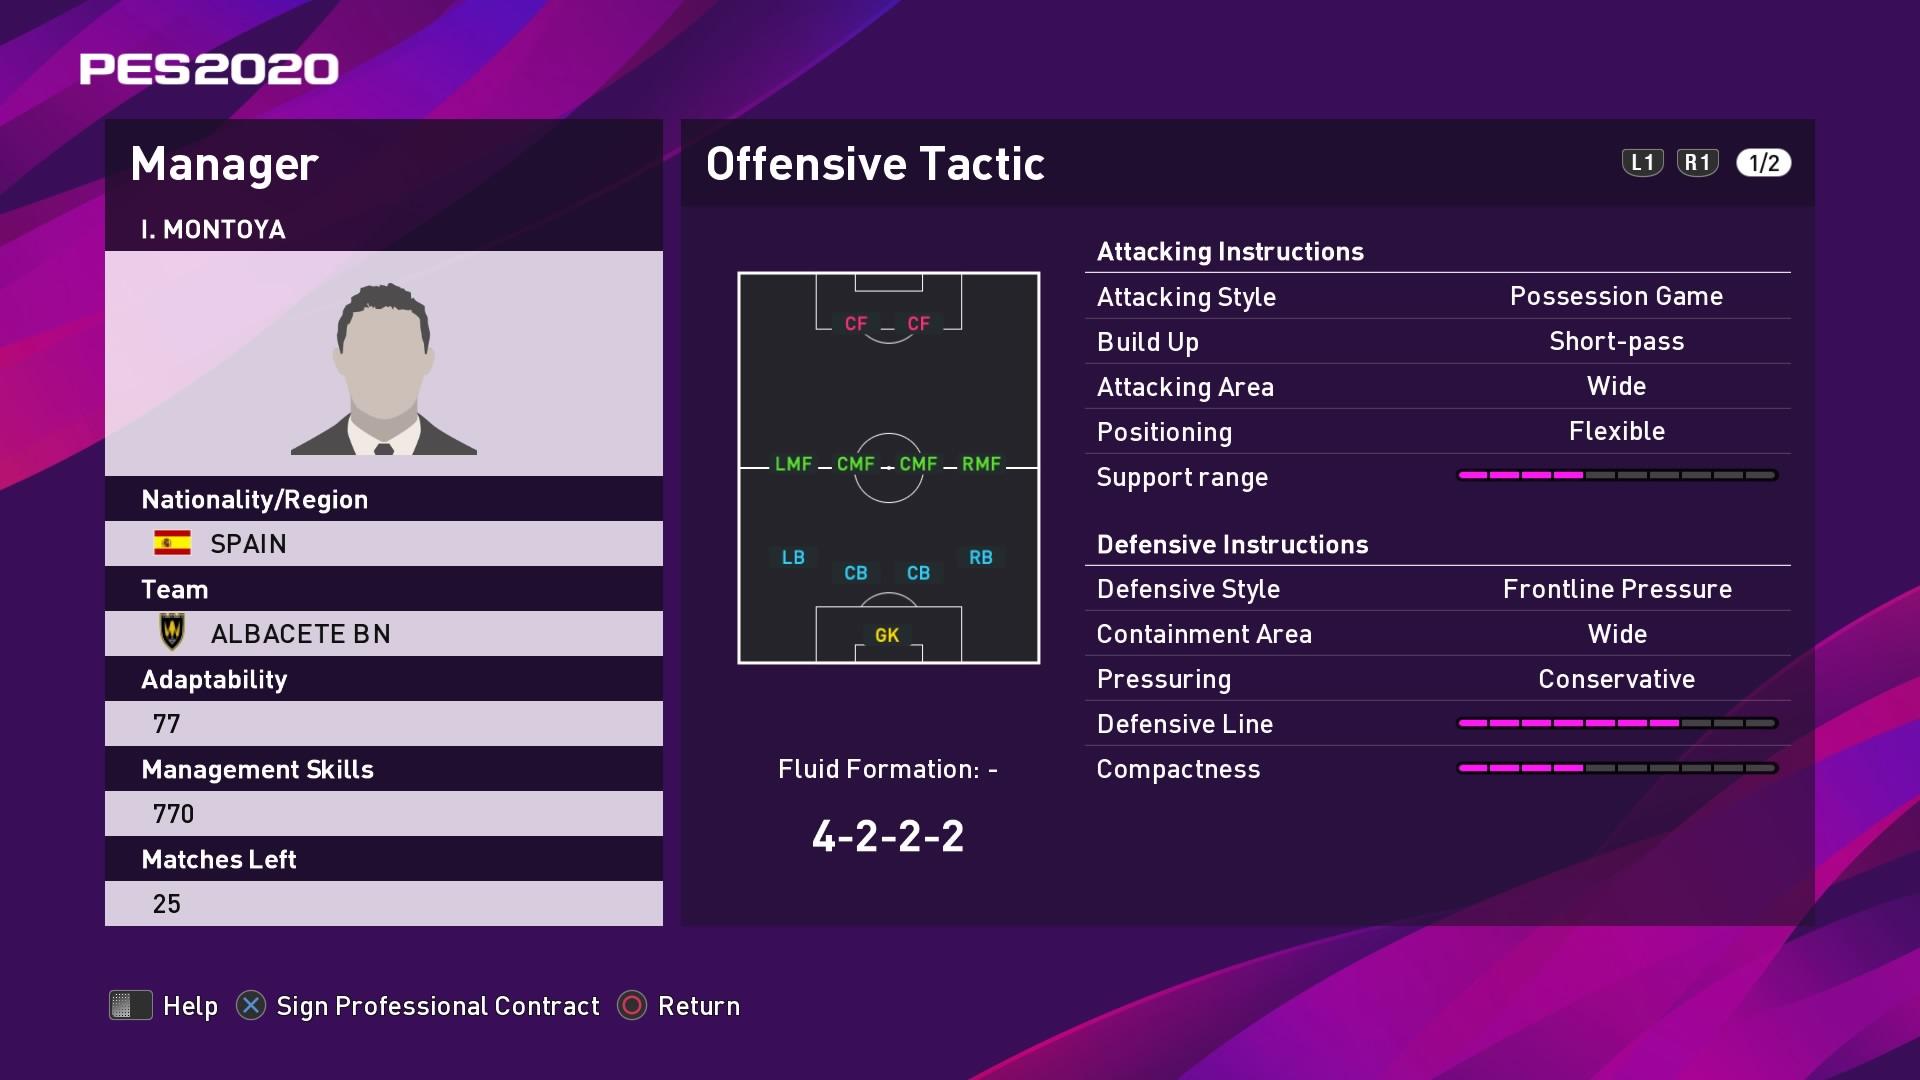 I. Montoya (2) (Luis Miguel Ramis) Offensive Tactic in PES 2020 myClub